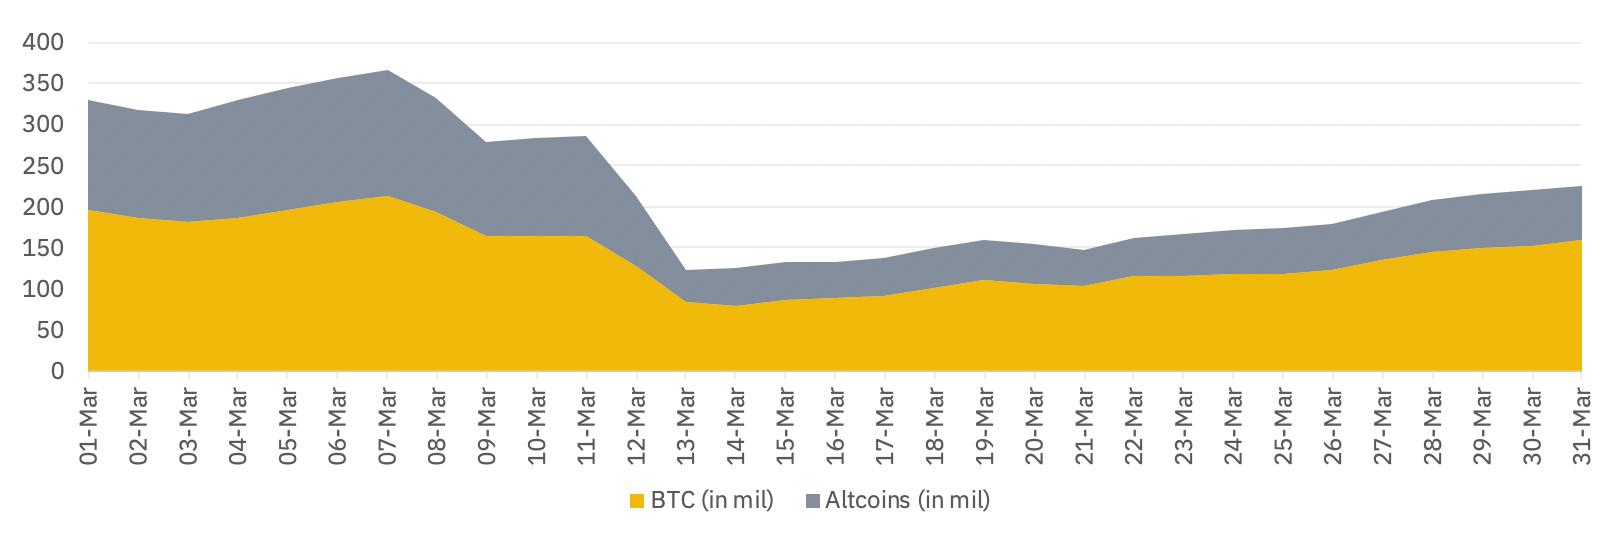 OI Altcoin vs BTC Binance Futures